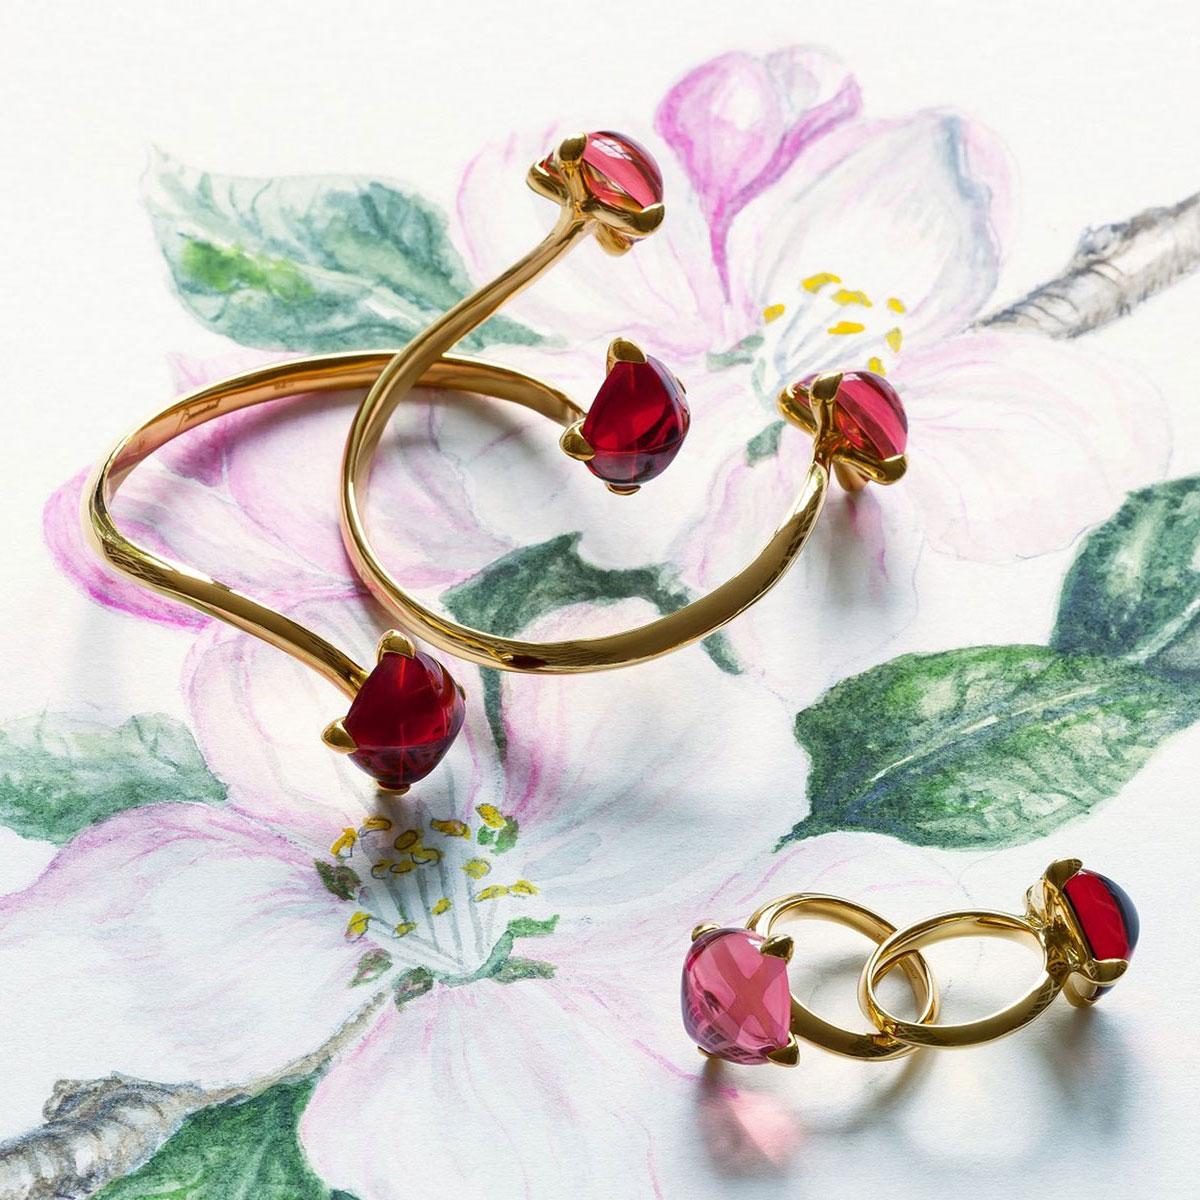 Baccarat Crystal Medicis You And Me Bracelet Vermeil Gold Pink